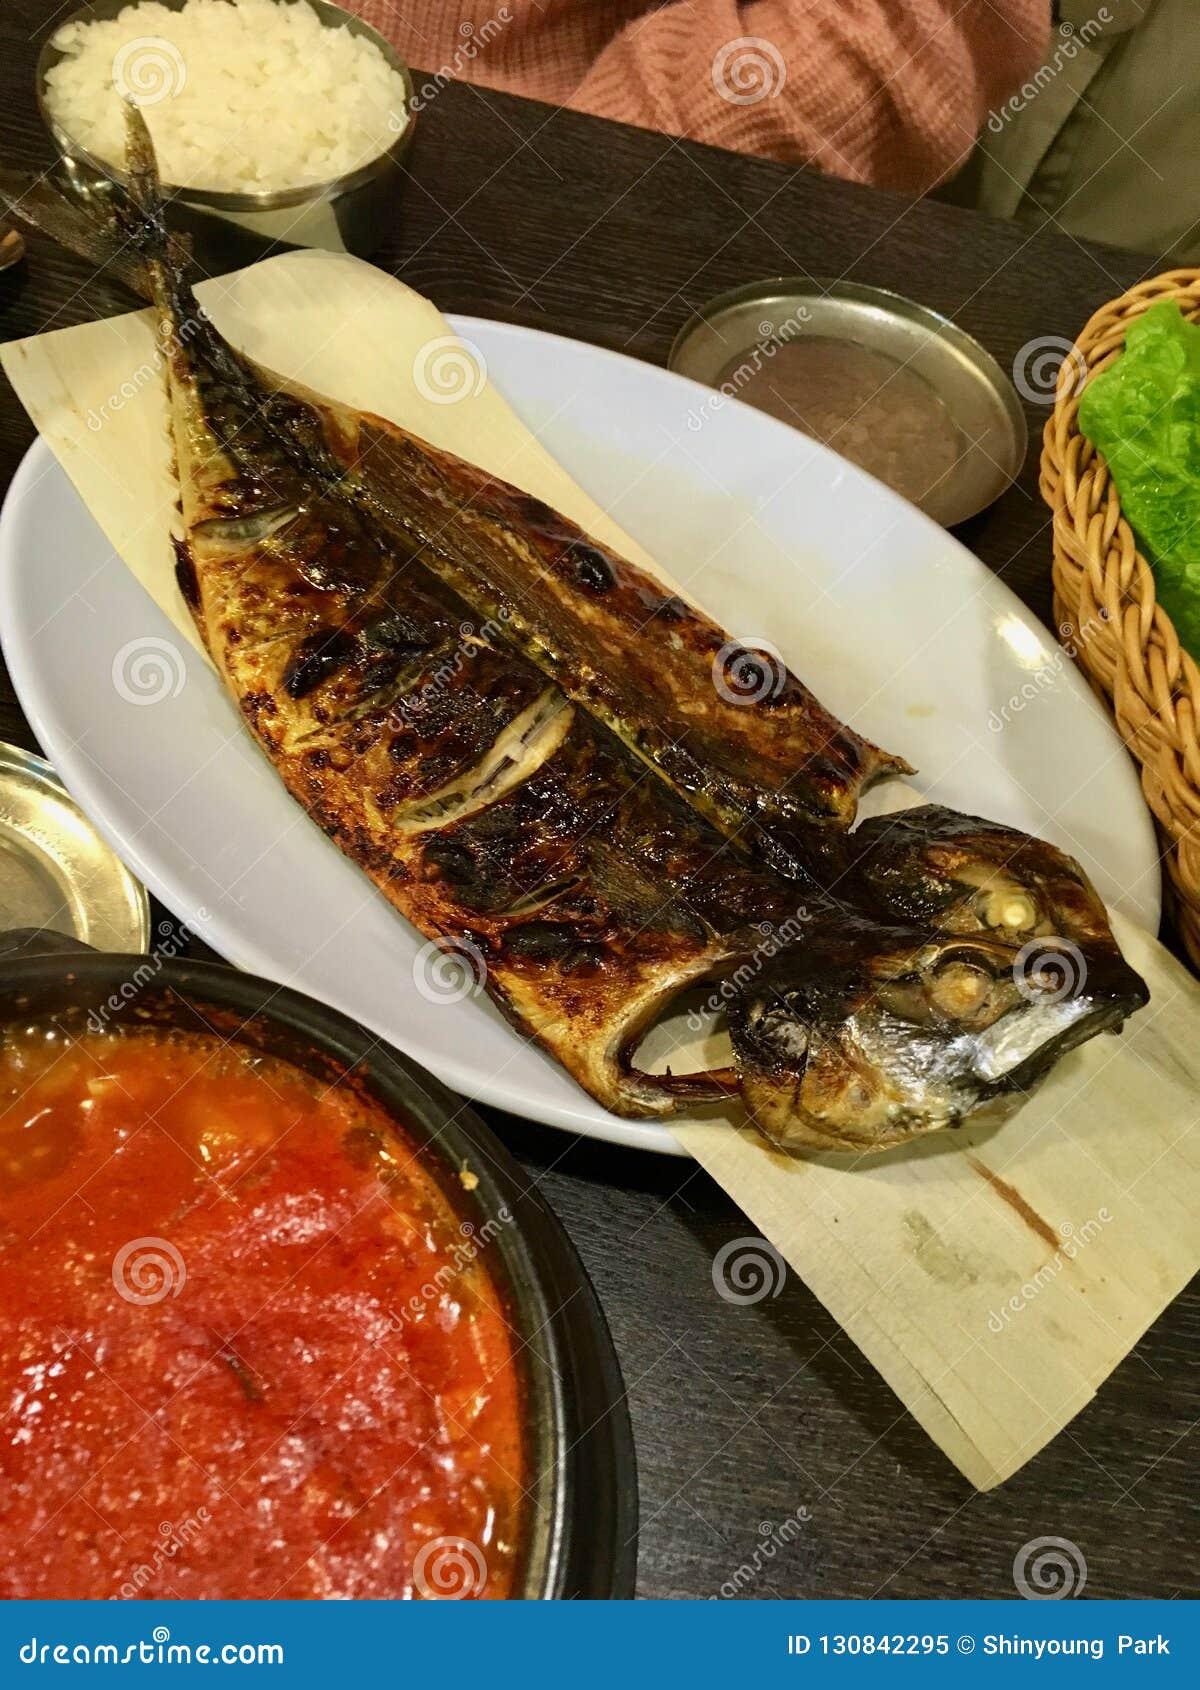 Godeungeo GUI - gegrillter koreanischer Makrelenteller